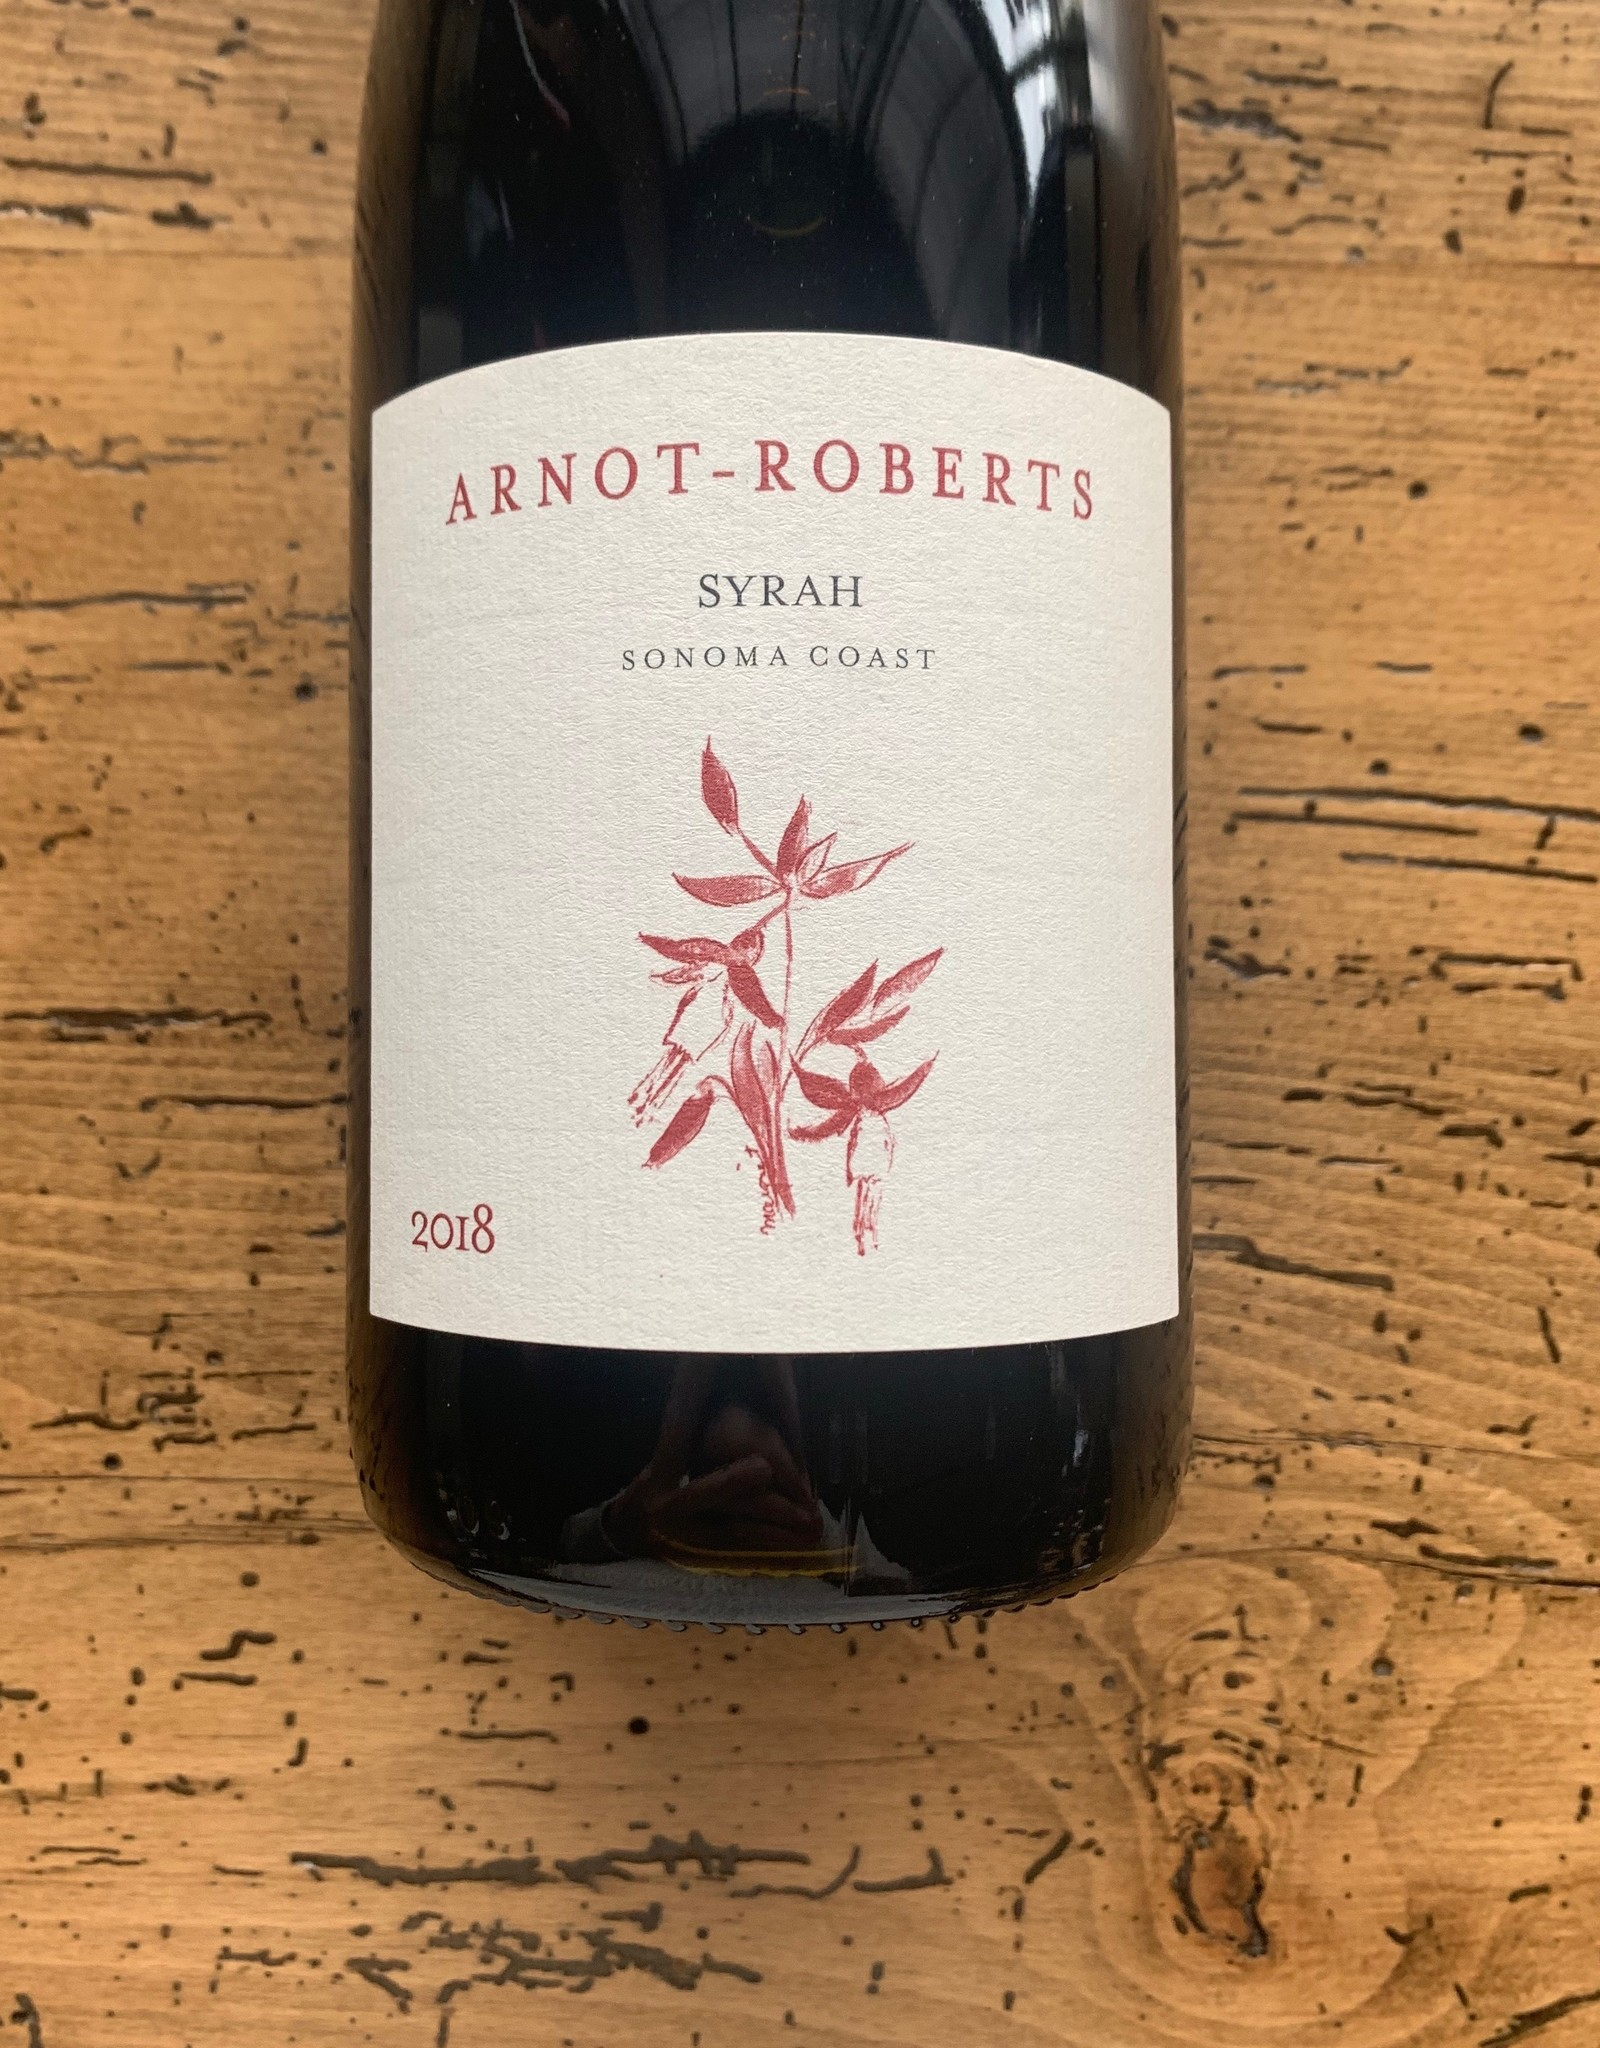 Arnot-Roberts Syrah Sonoma Coast